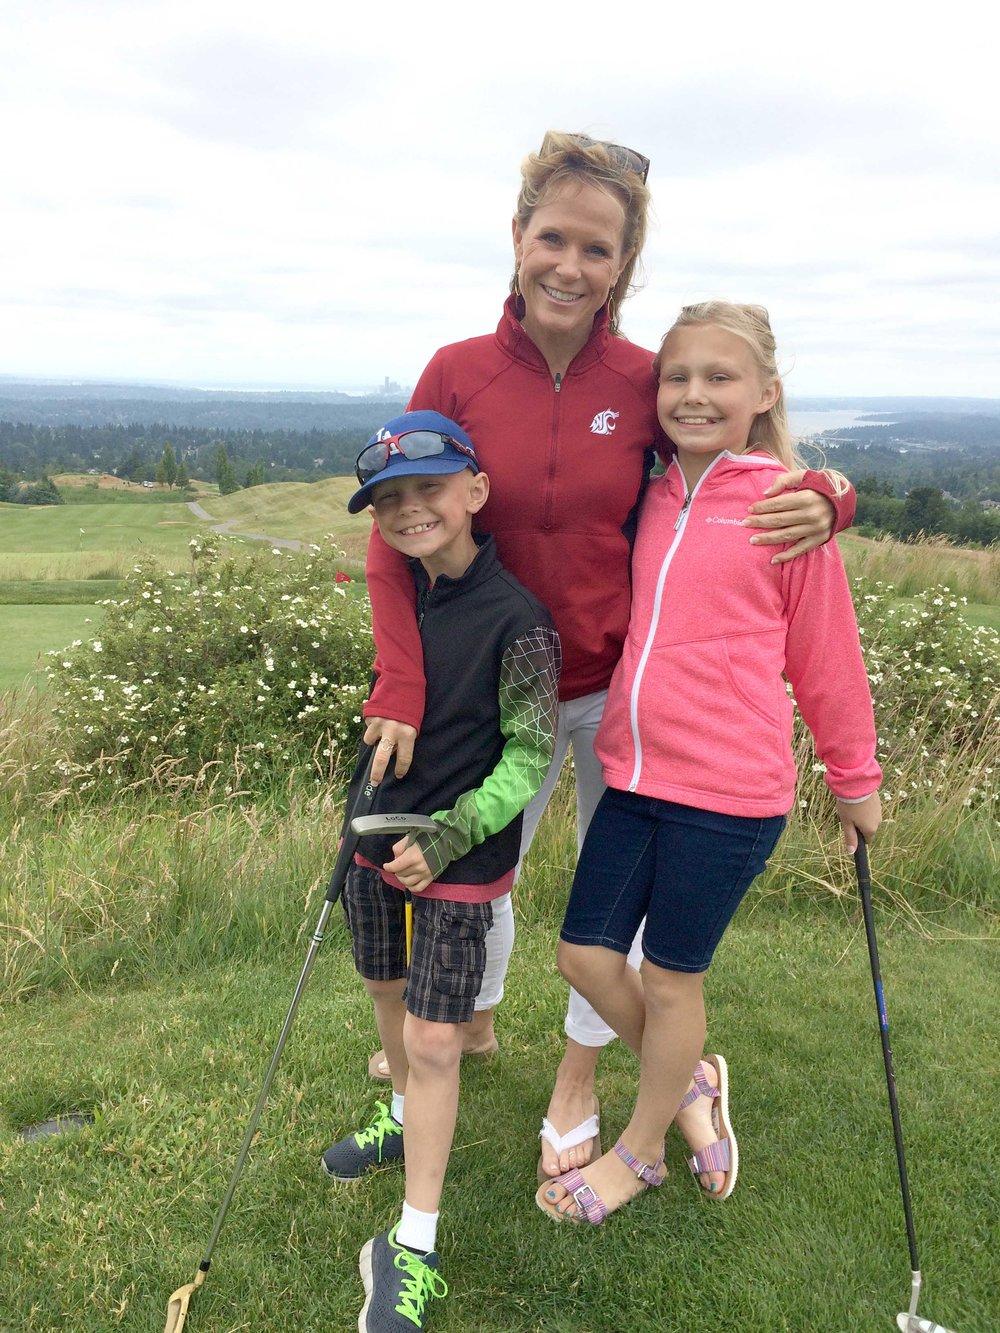 Golfing with my niece and nephew